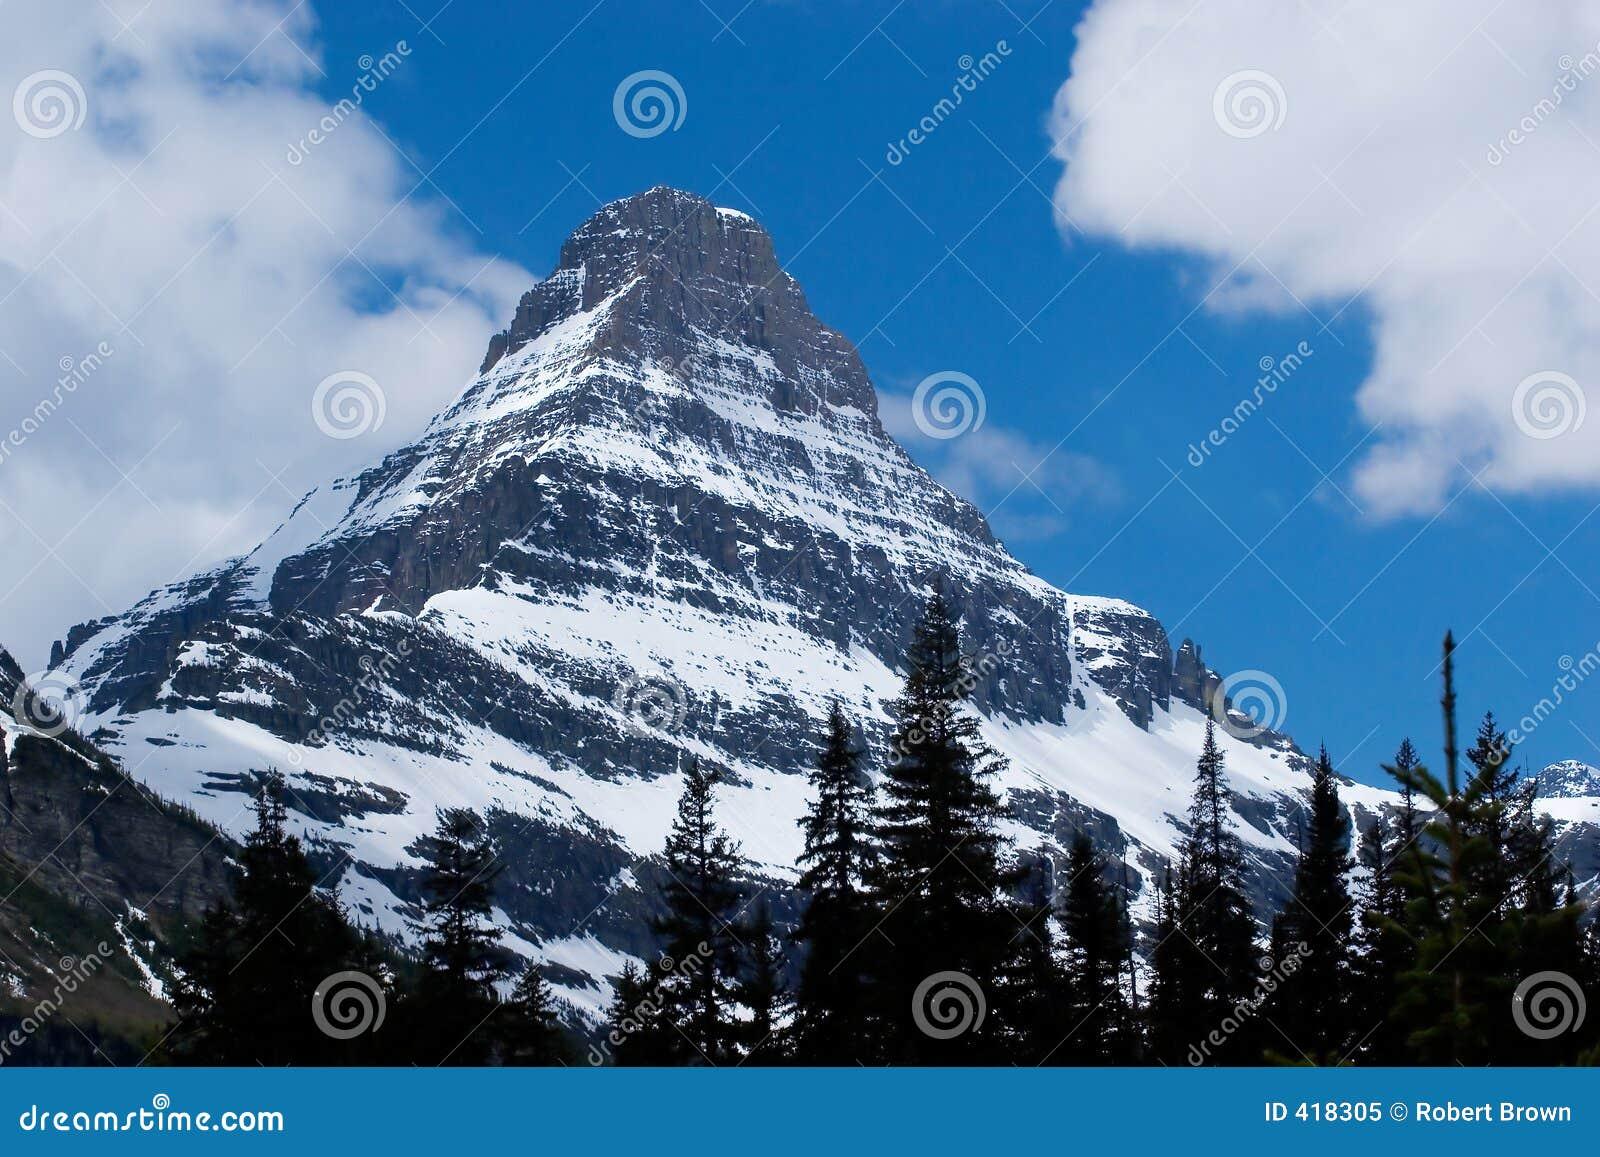 Peak, Glacier National Park